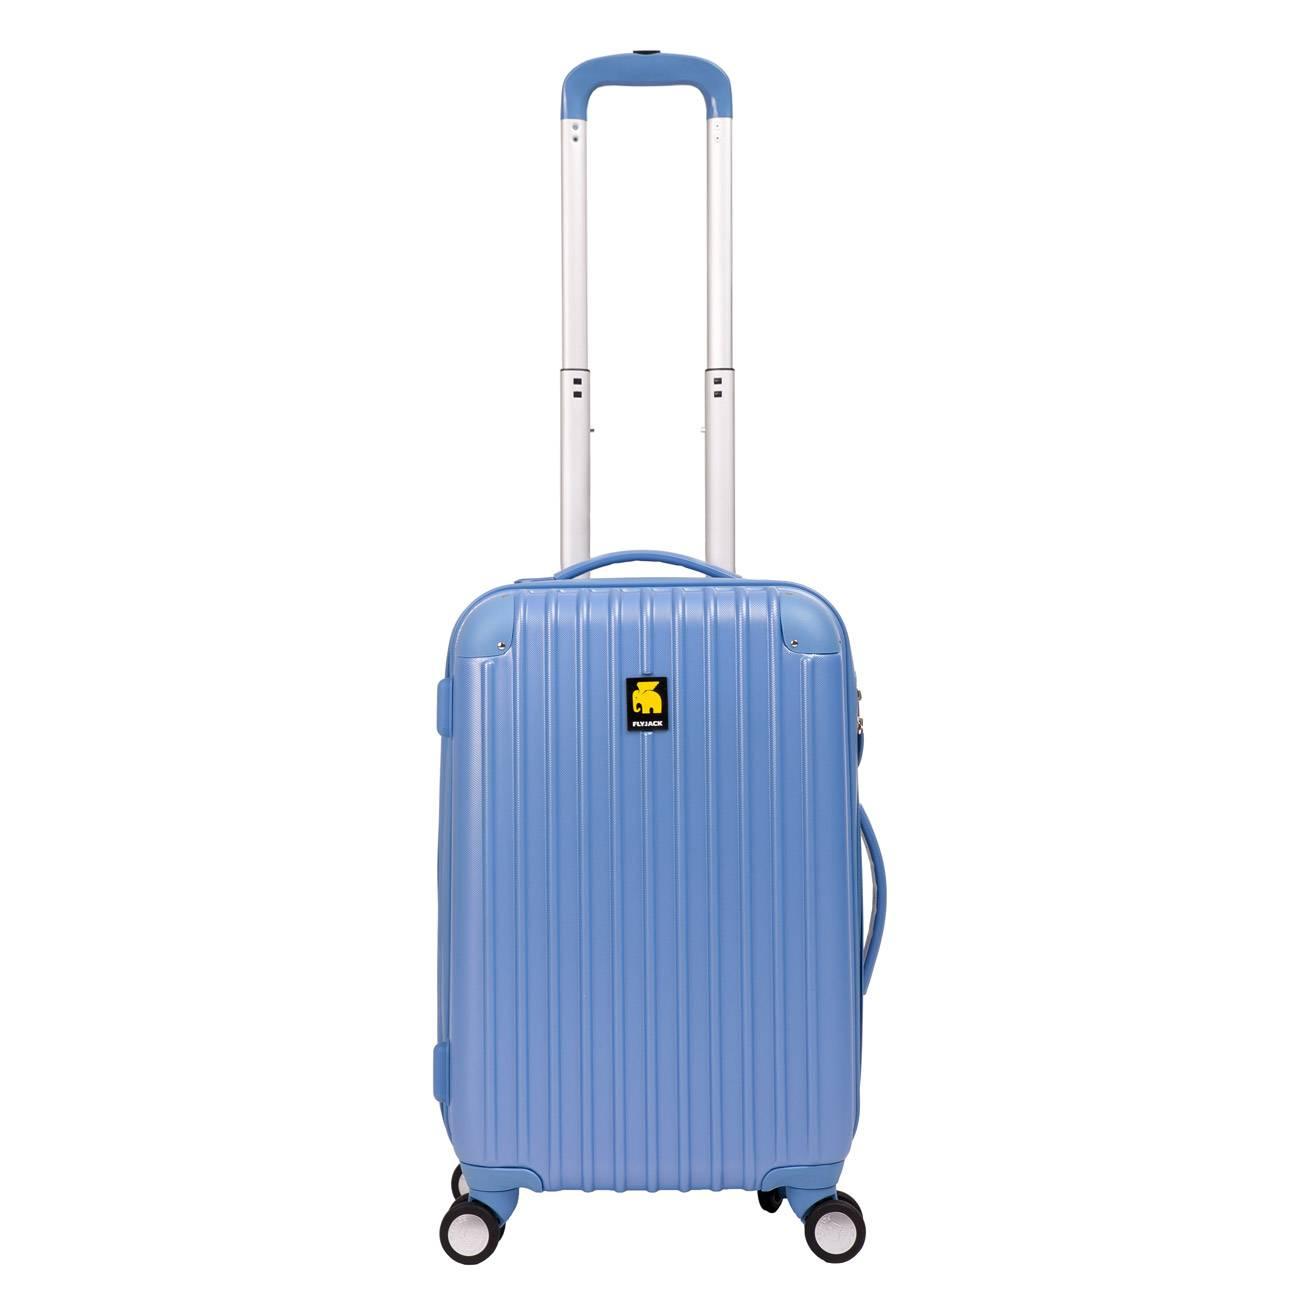 ABS PALERMO BLUE CASE 20